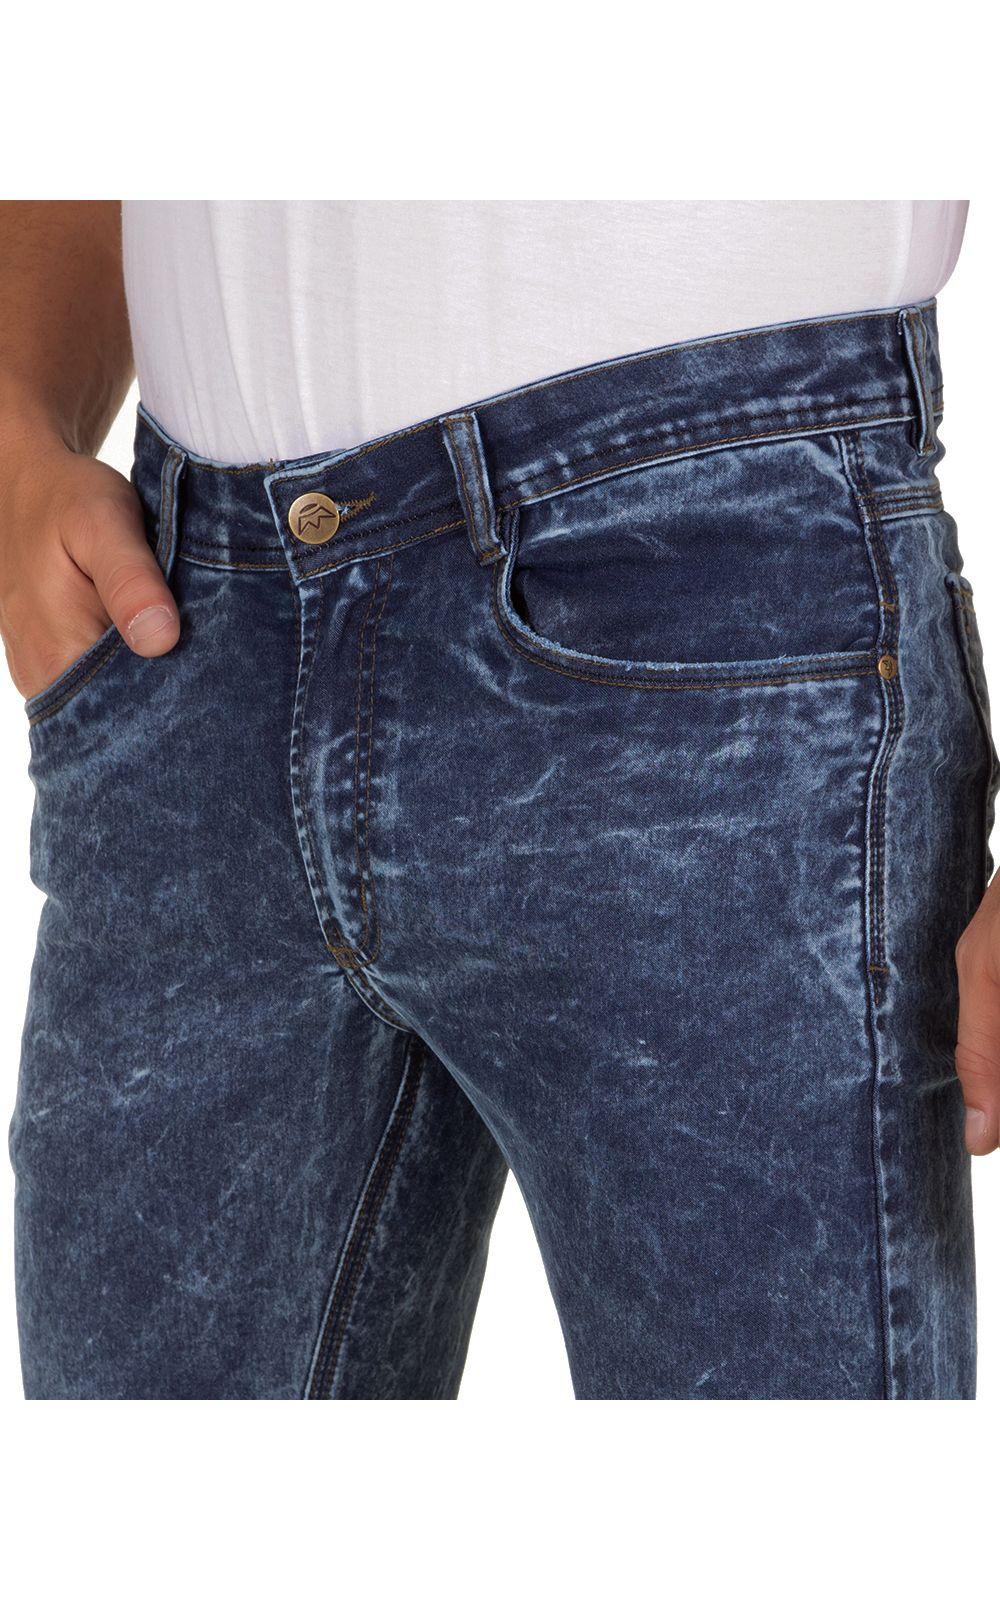 Foto 3 - Calça Jeans Masculina Azul Escuro Texturizada